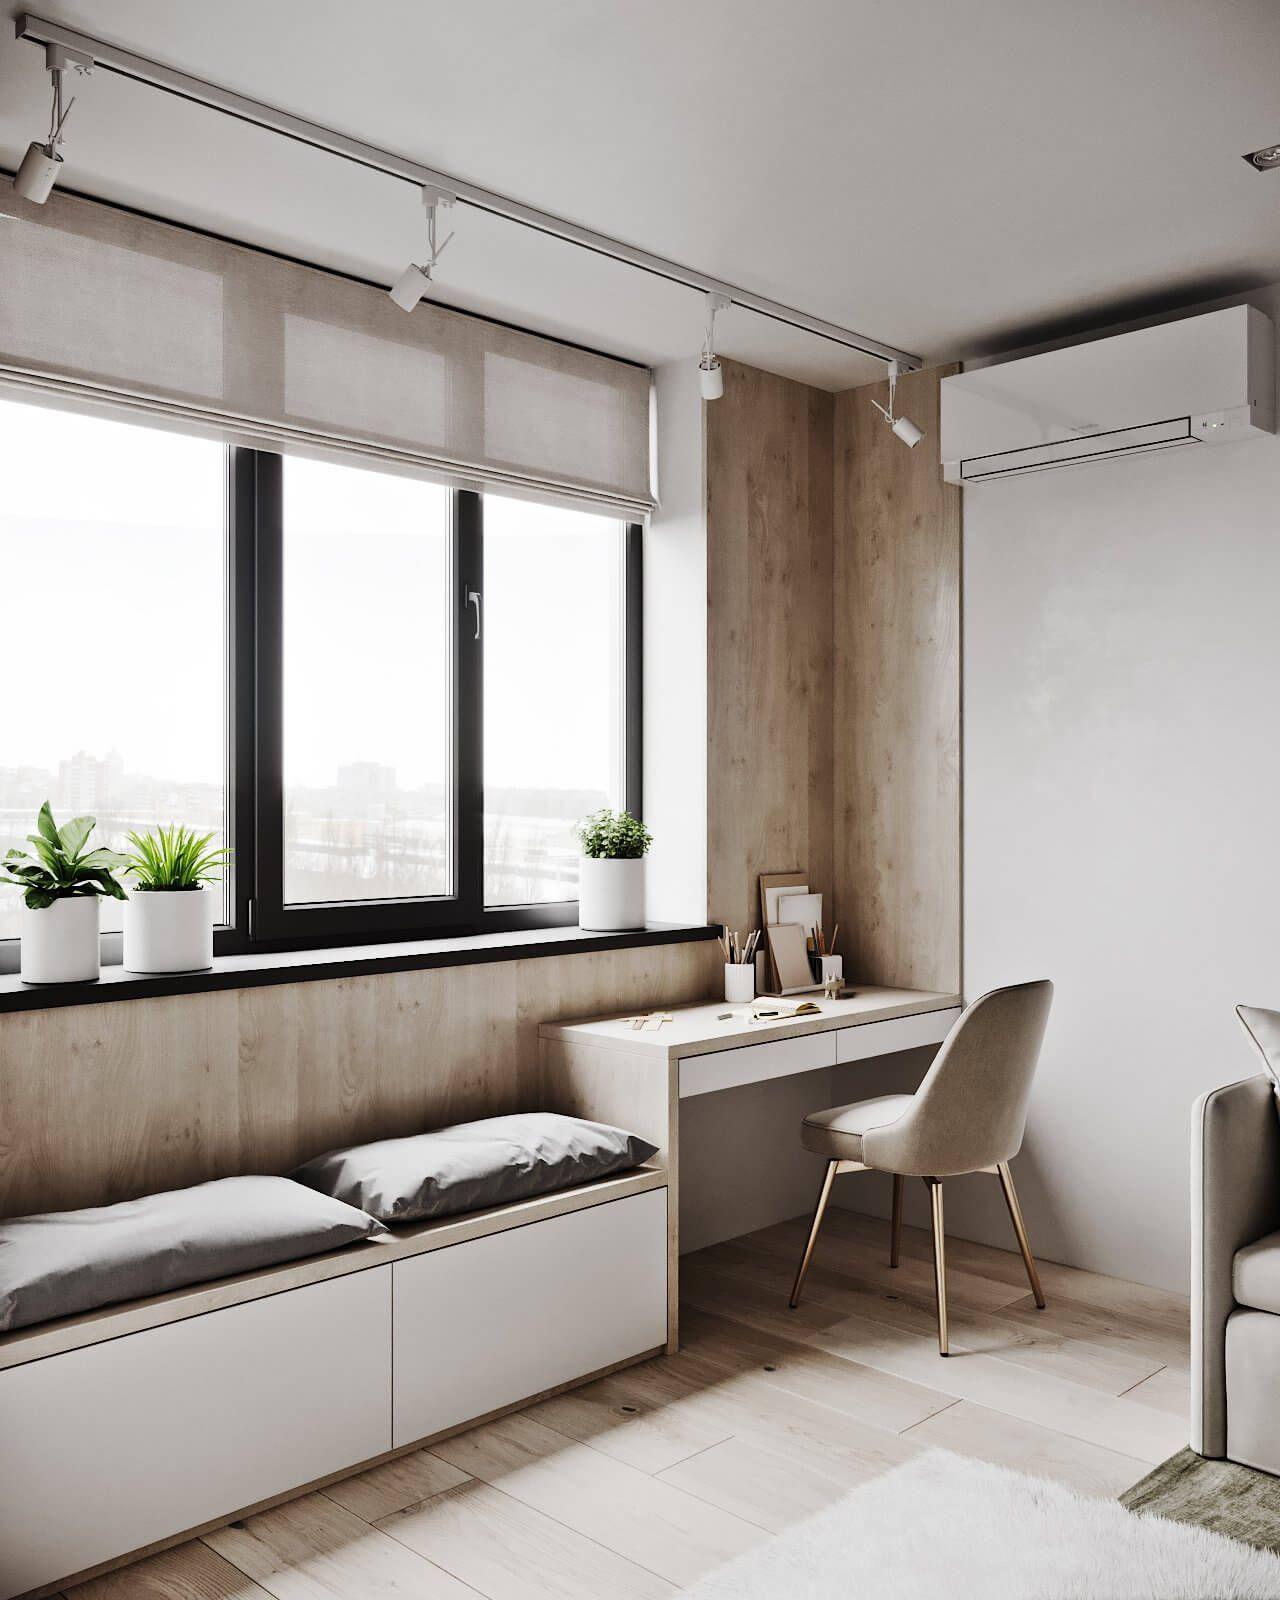 Autodesk Room Design: Modern Tenderness Flat // Cgi Visualization In 2020